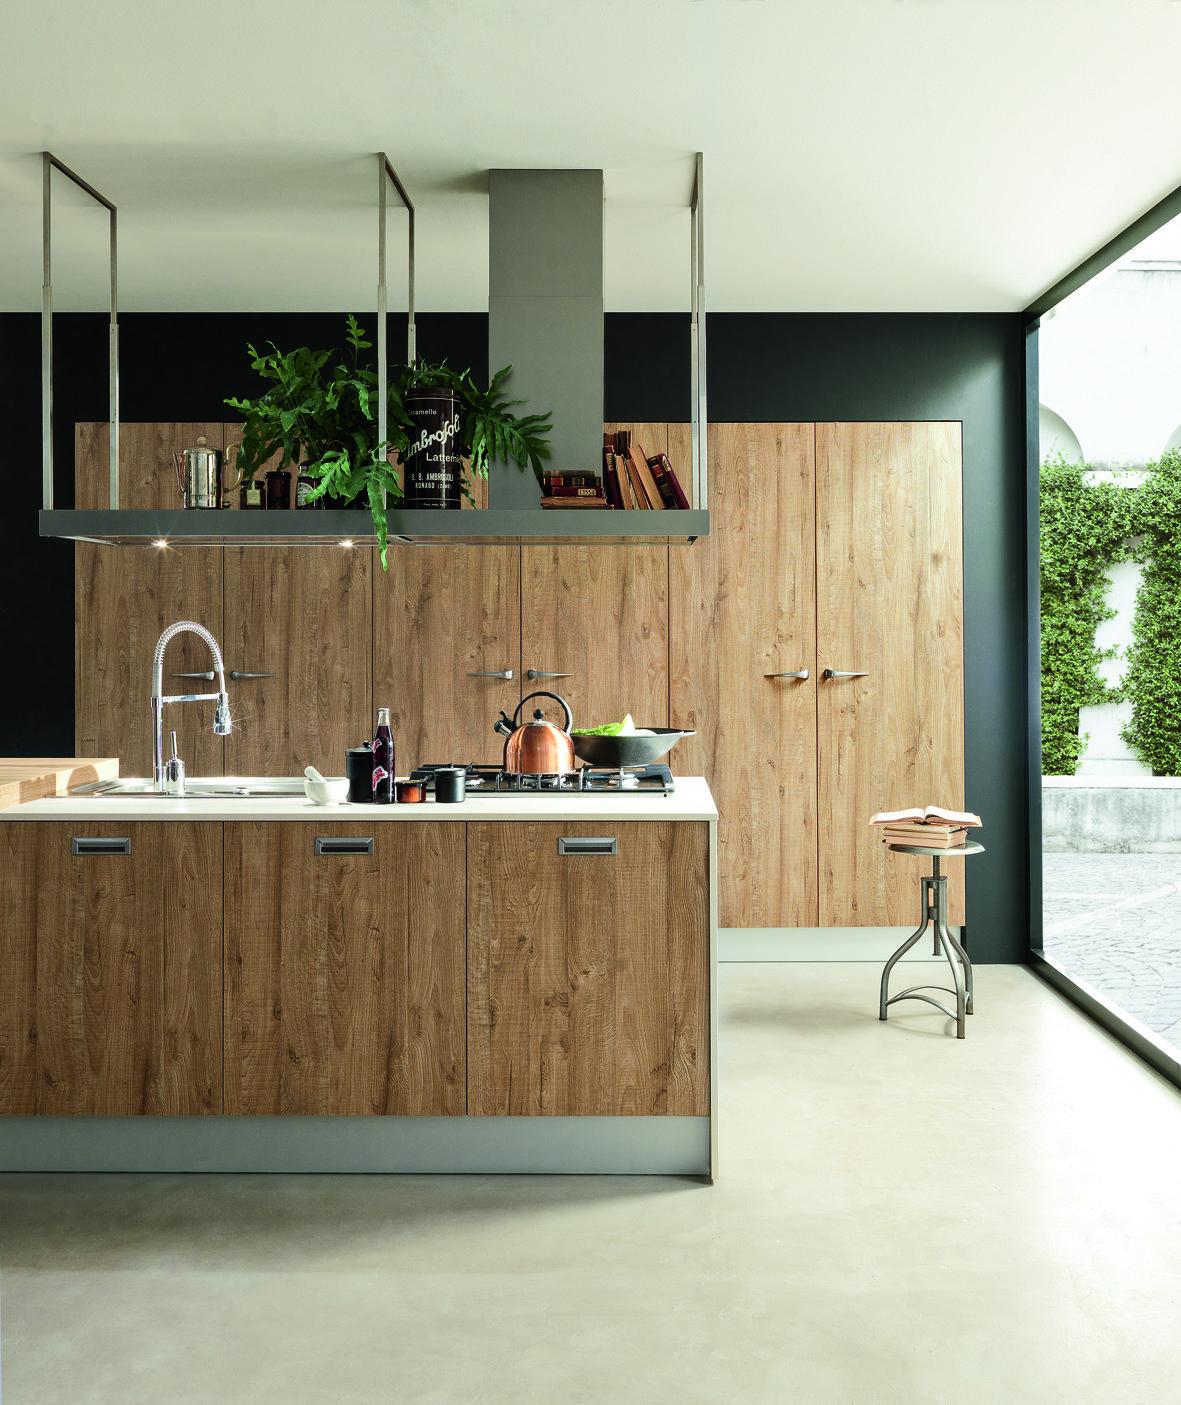 Cucine industrial style cose di casa for Cappa sospesa per isola